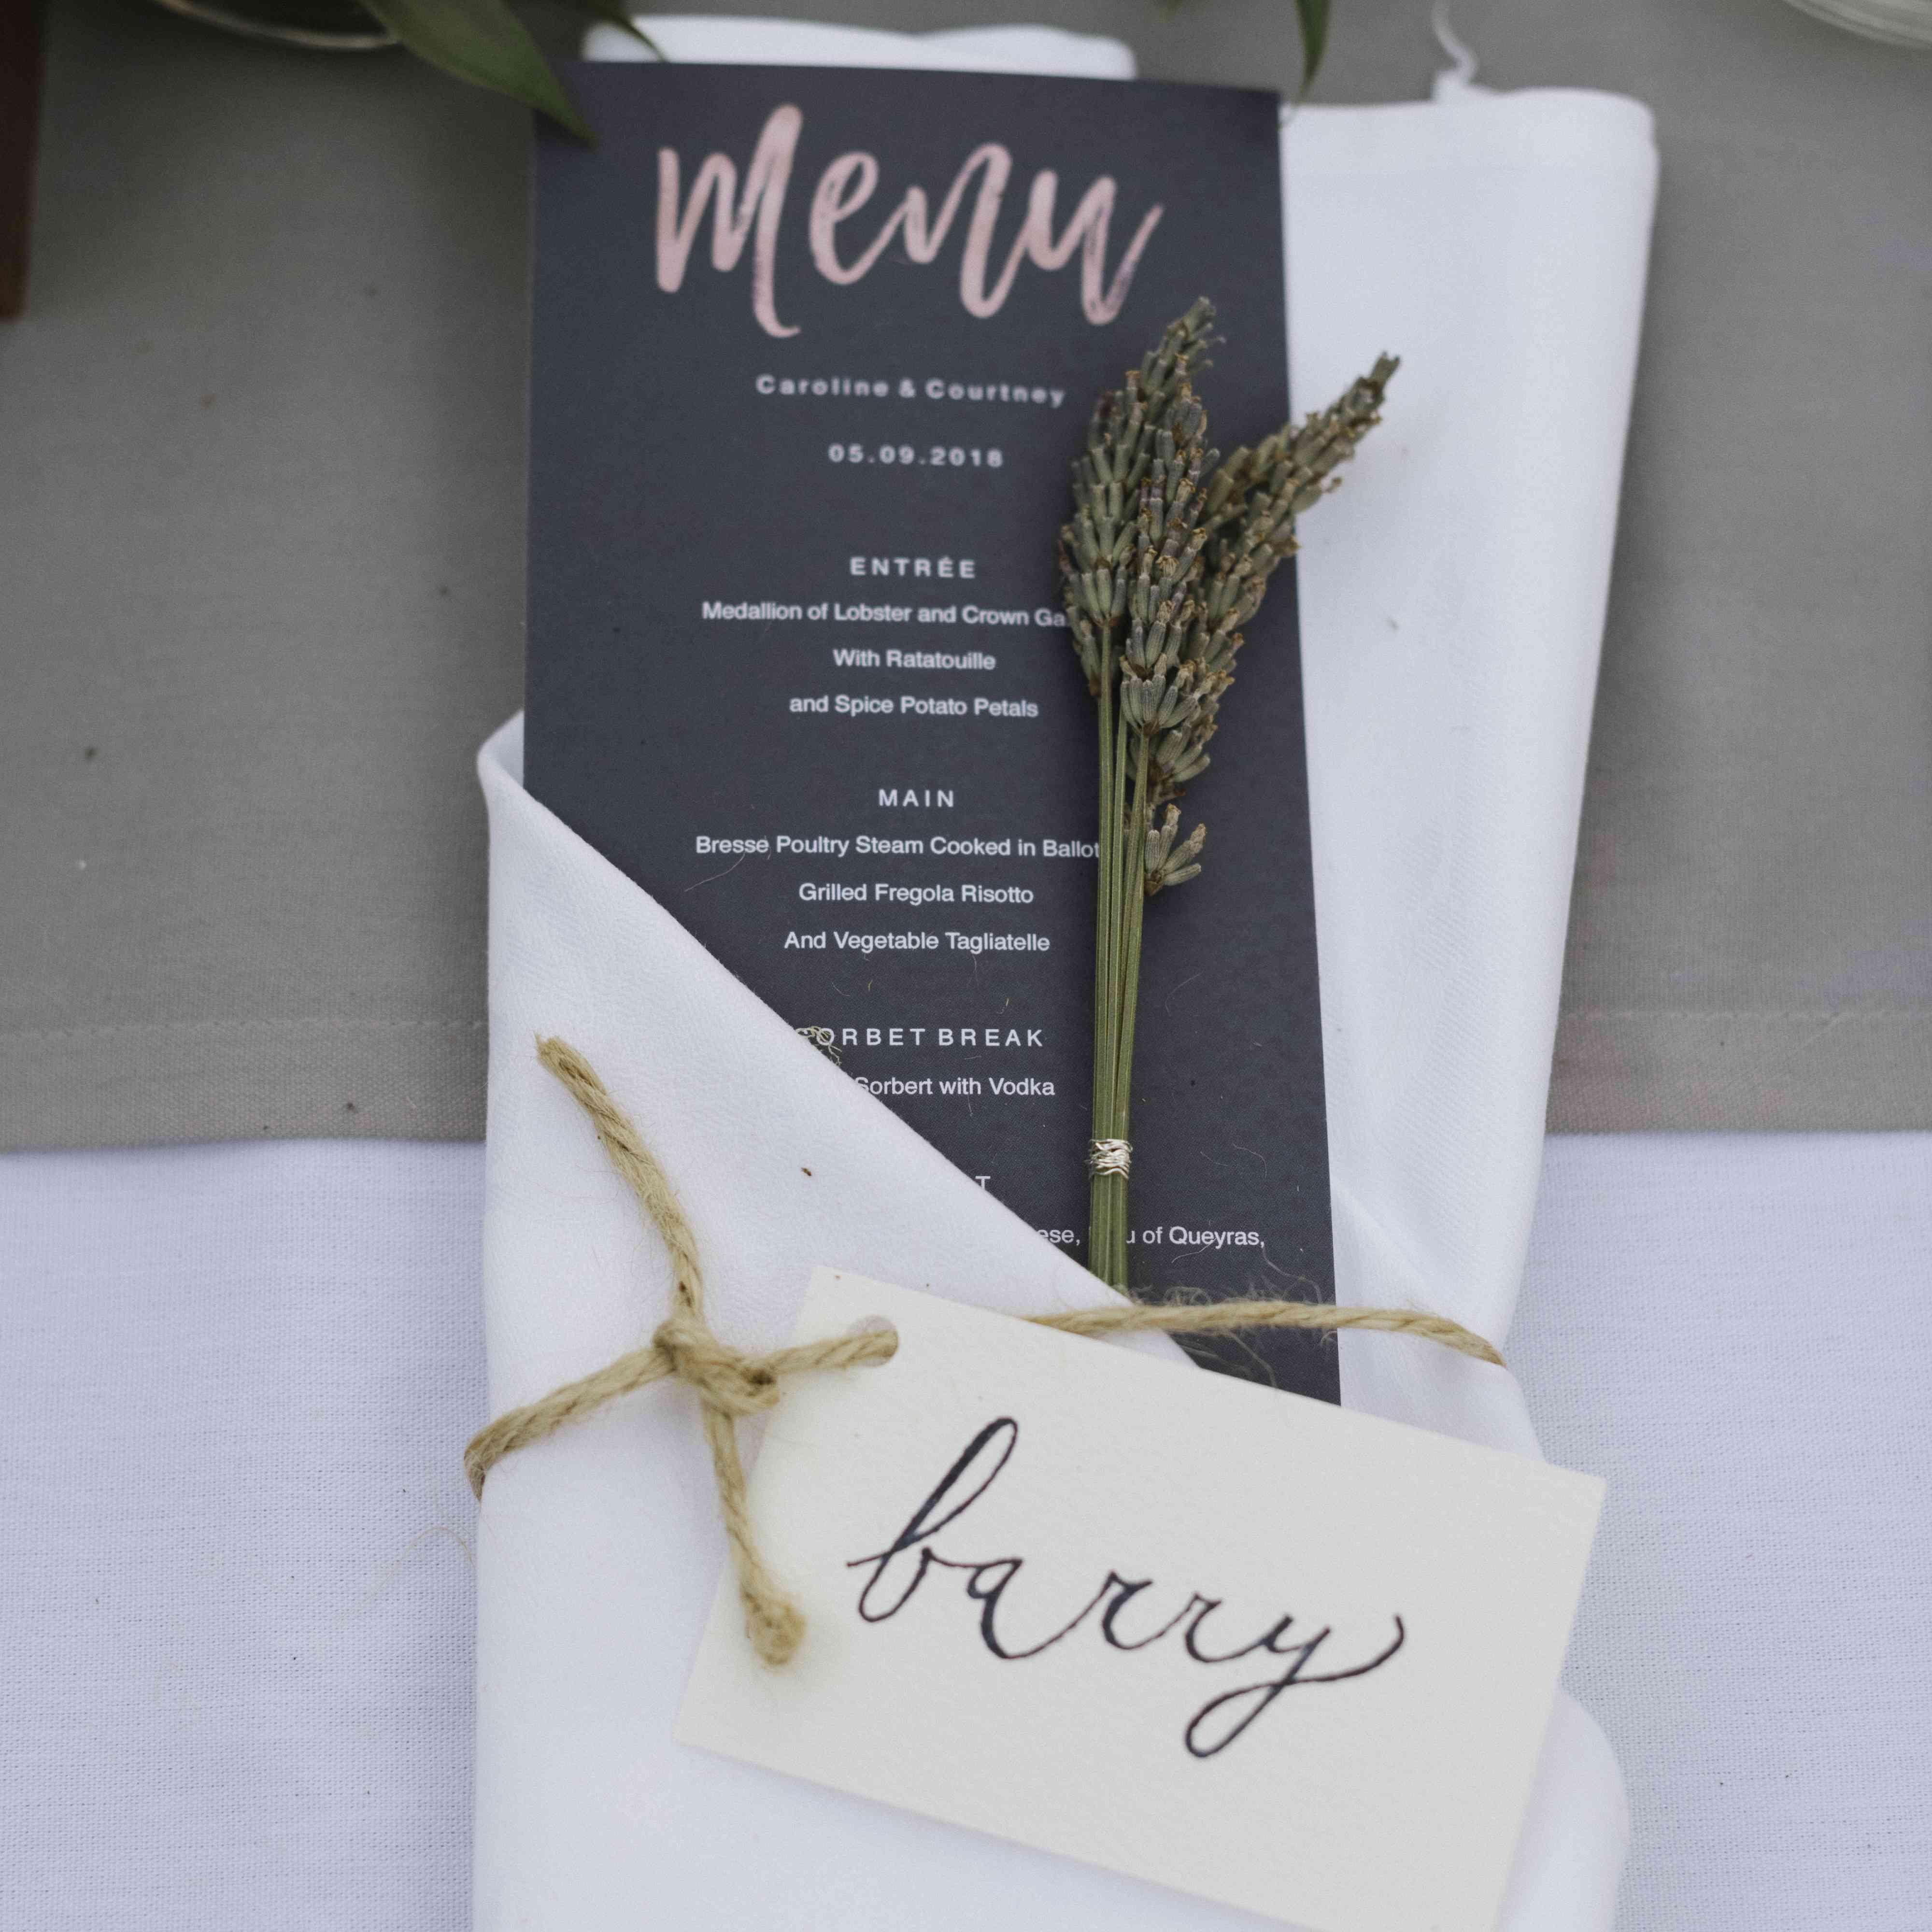 <p>wedding reception dinner menu tucked into napkin</p><br><br>